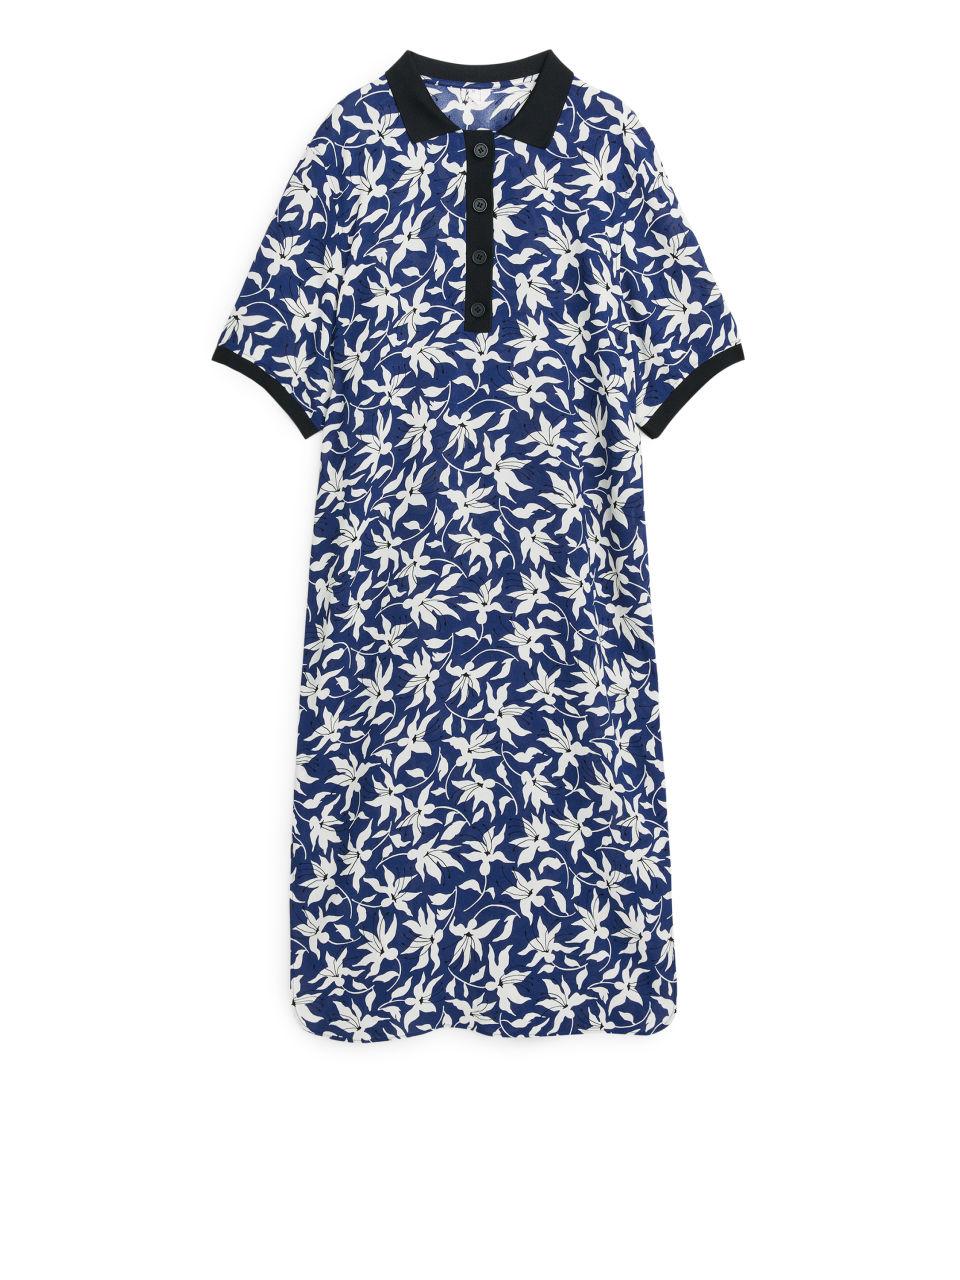 Floral Polo Dress - Blue